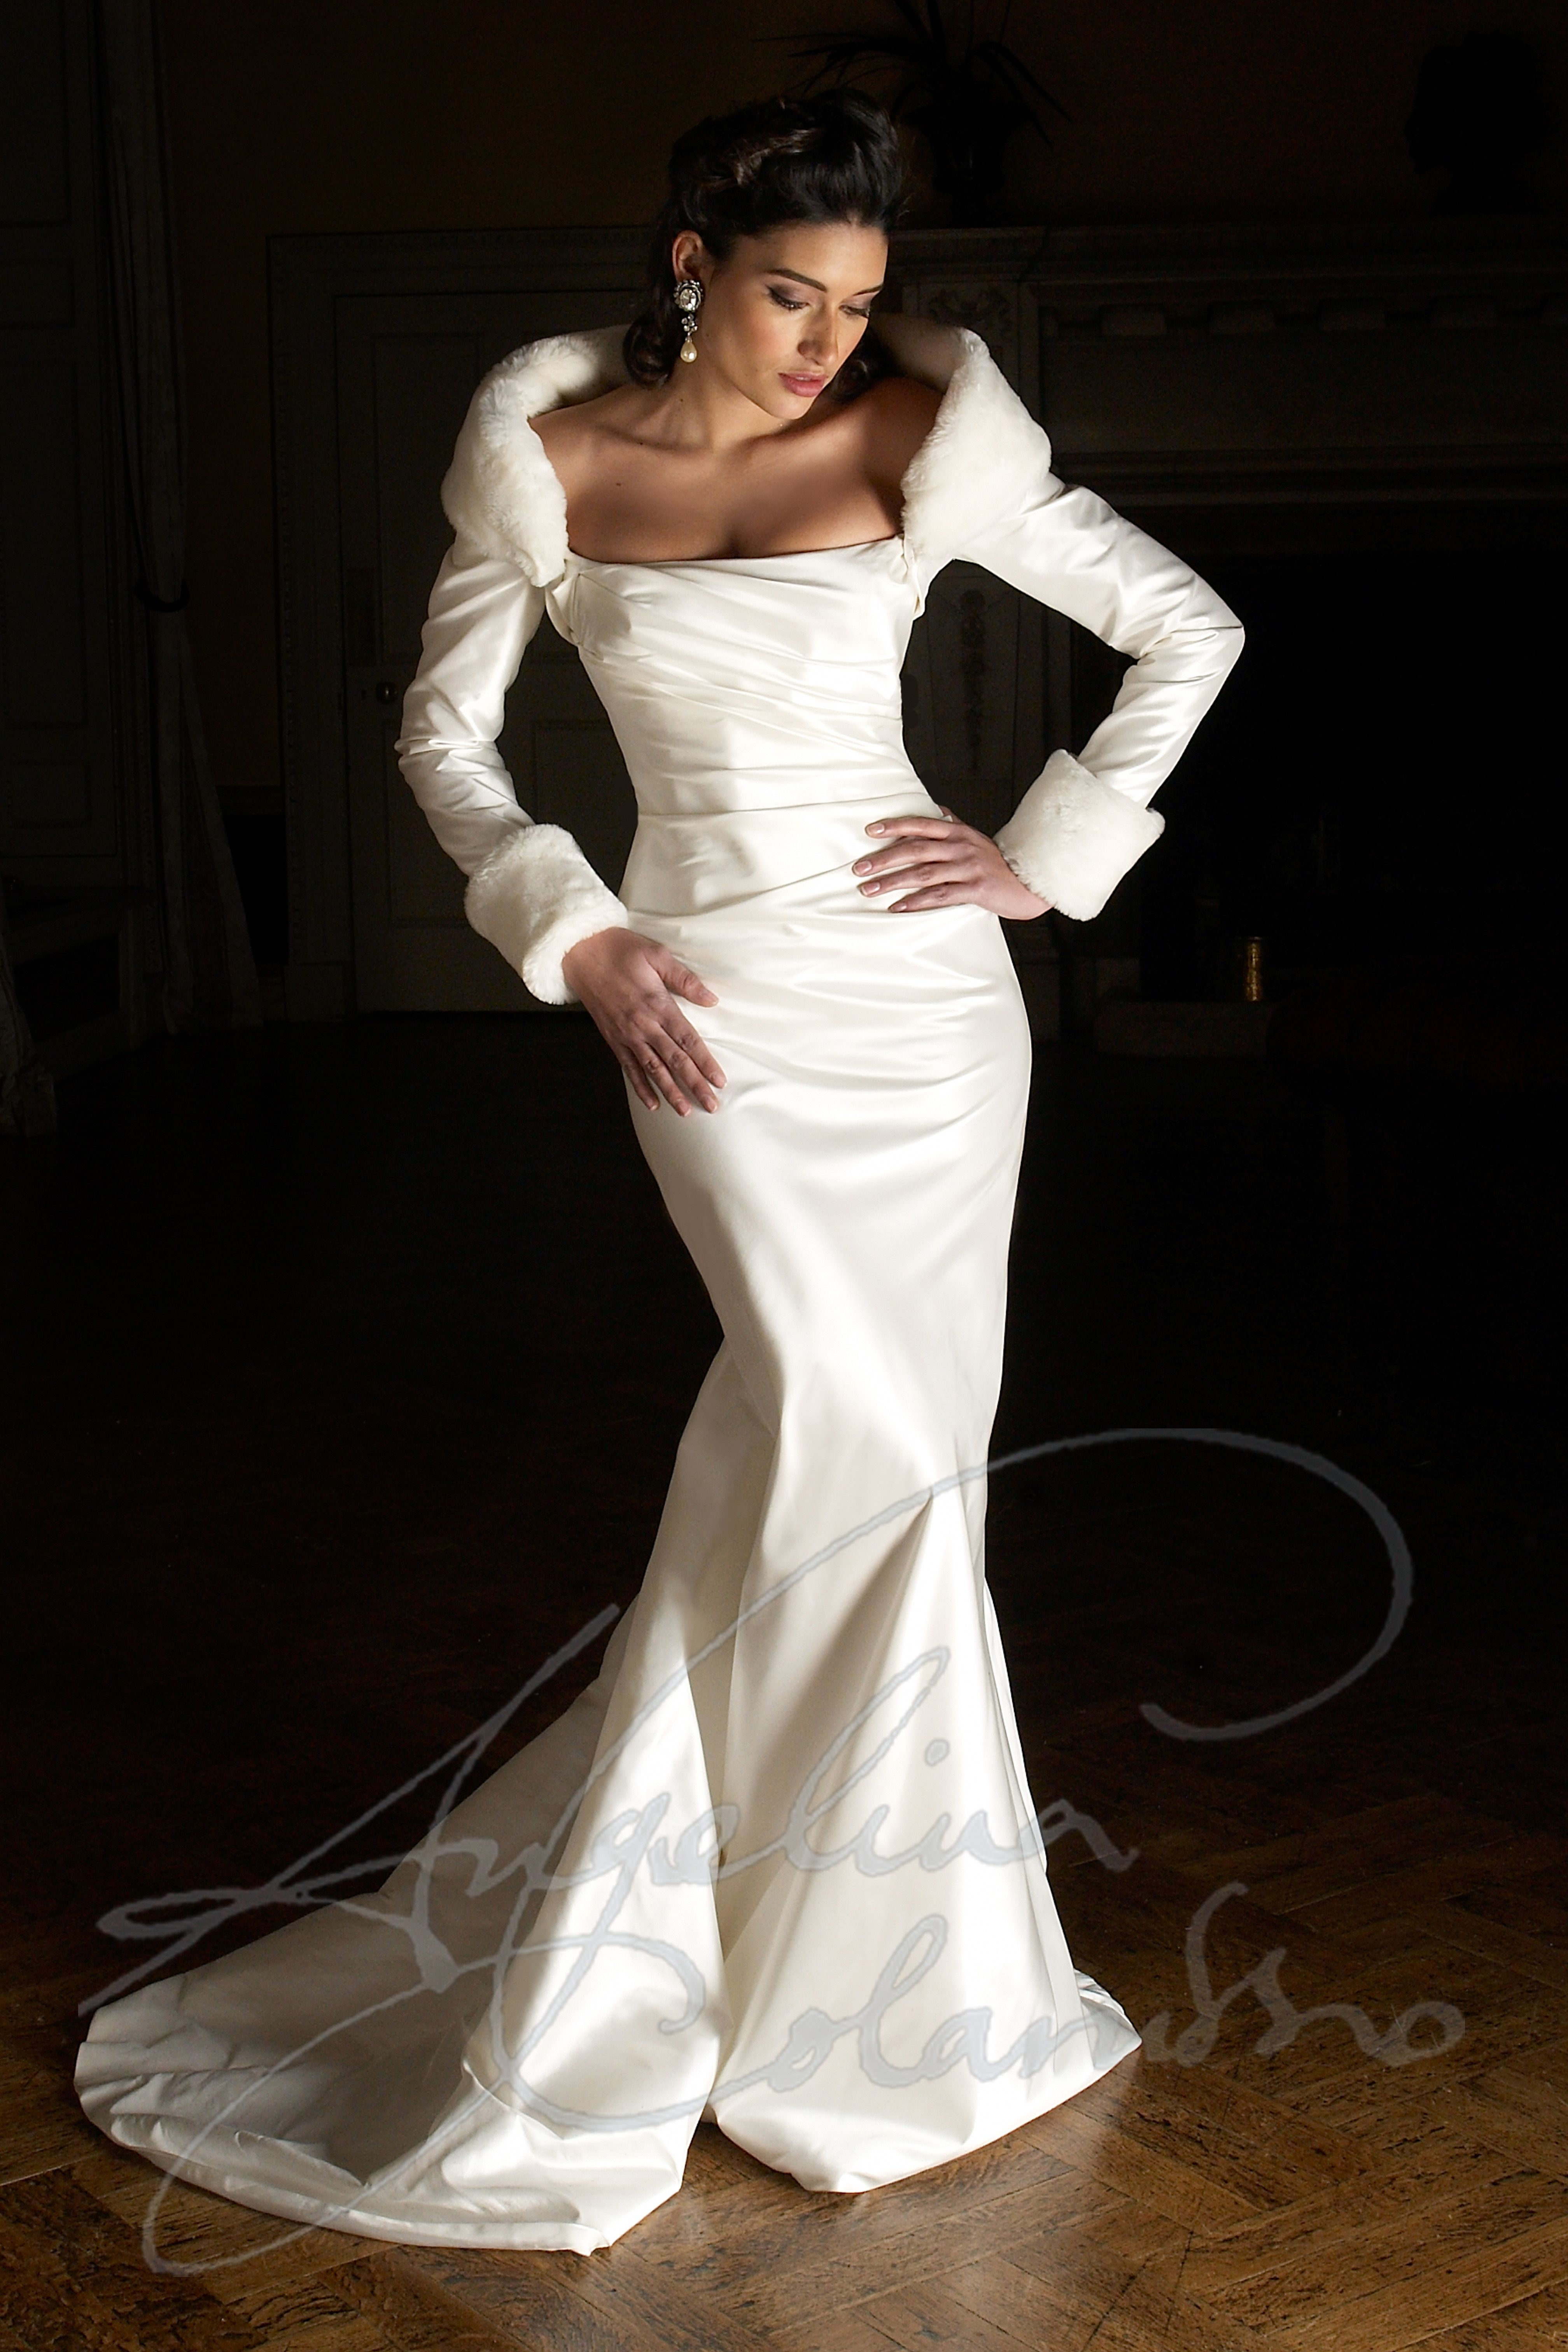 Anoushka Wedding Dress By Angelina Colarusso Winter Wedding Gowns Wedding Dresses Velvet Wedding Dress [ 6048 x 4032 Pixel ]